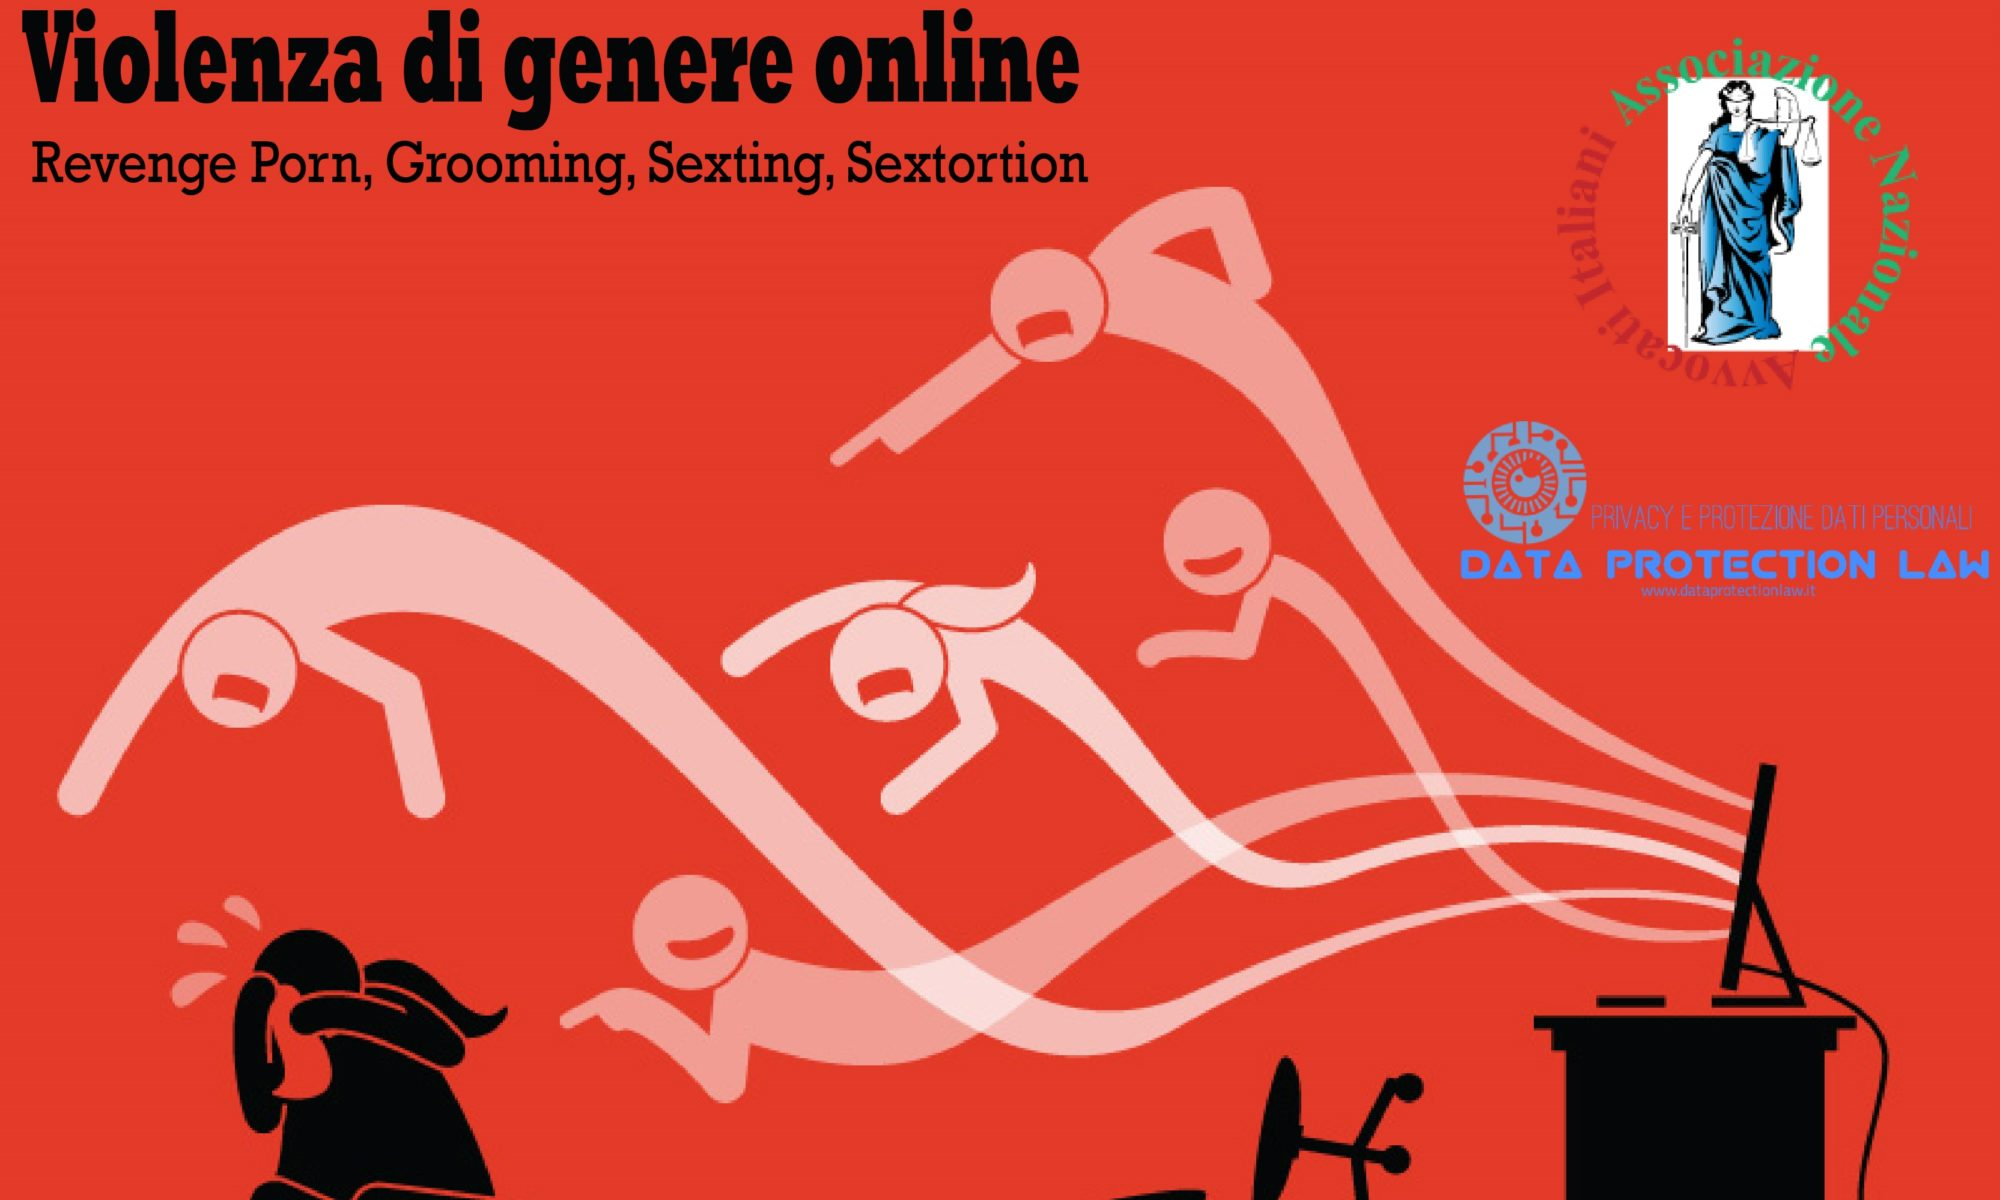 violenza di genere online revenge porn